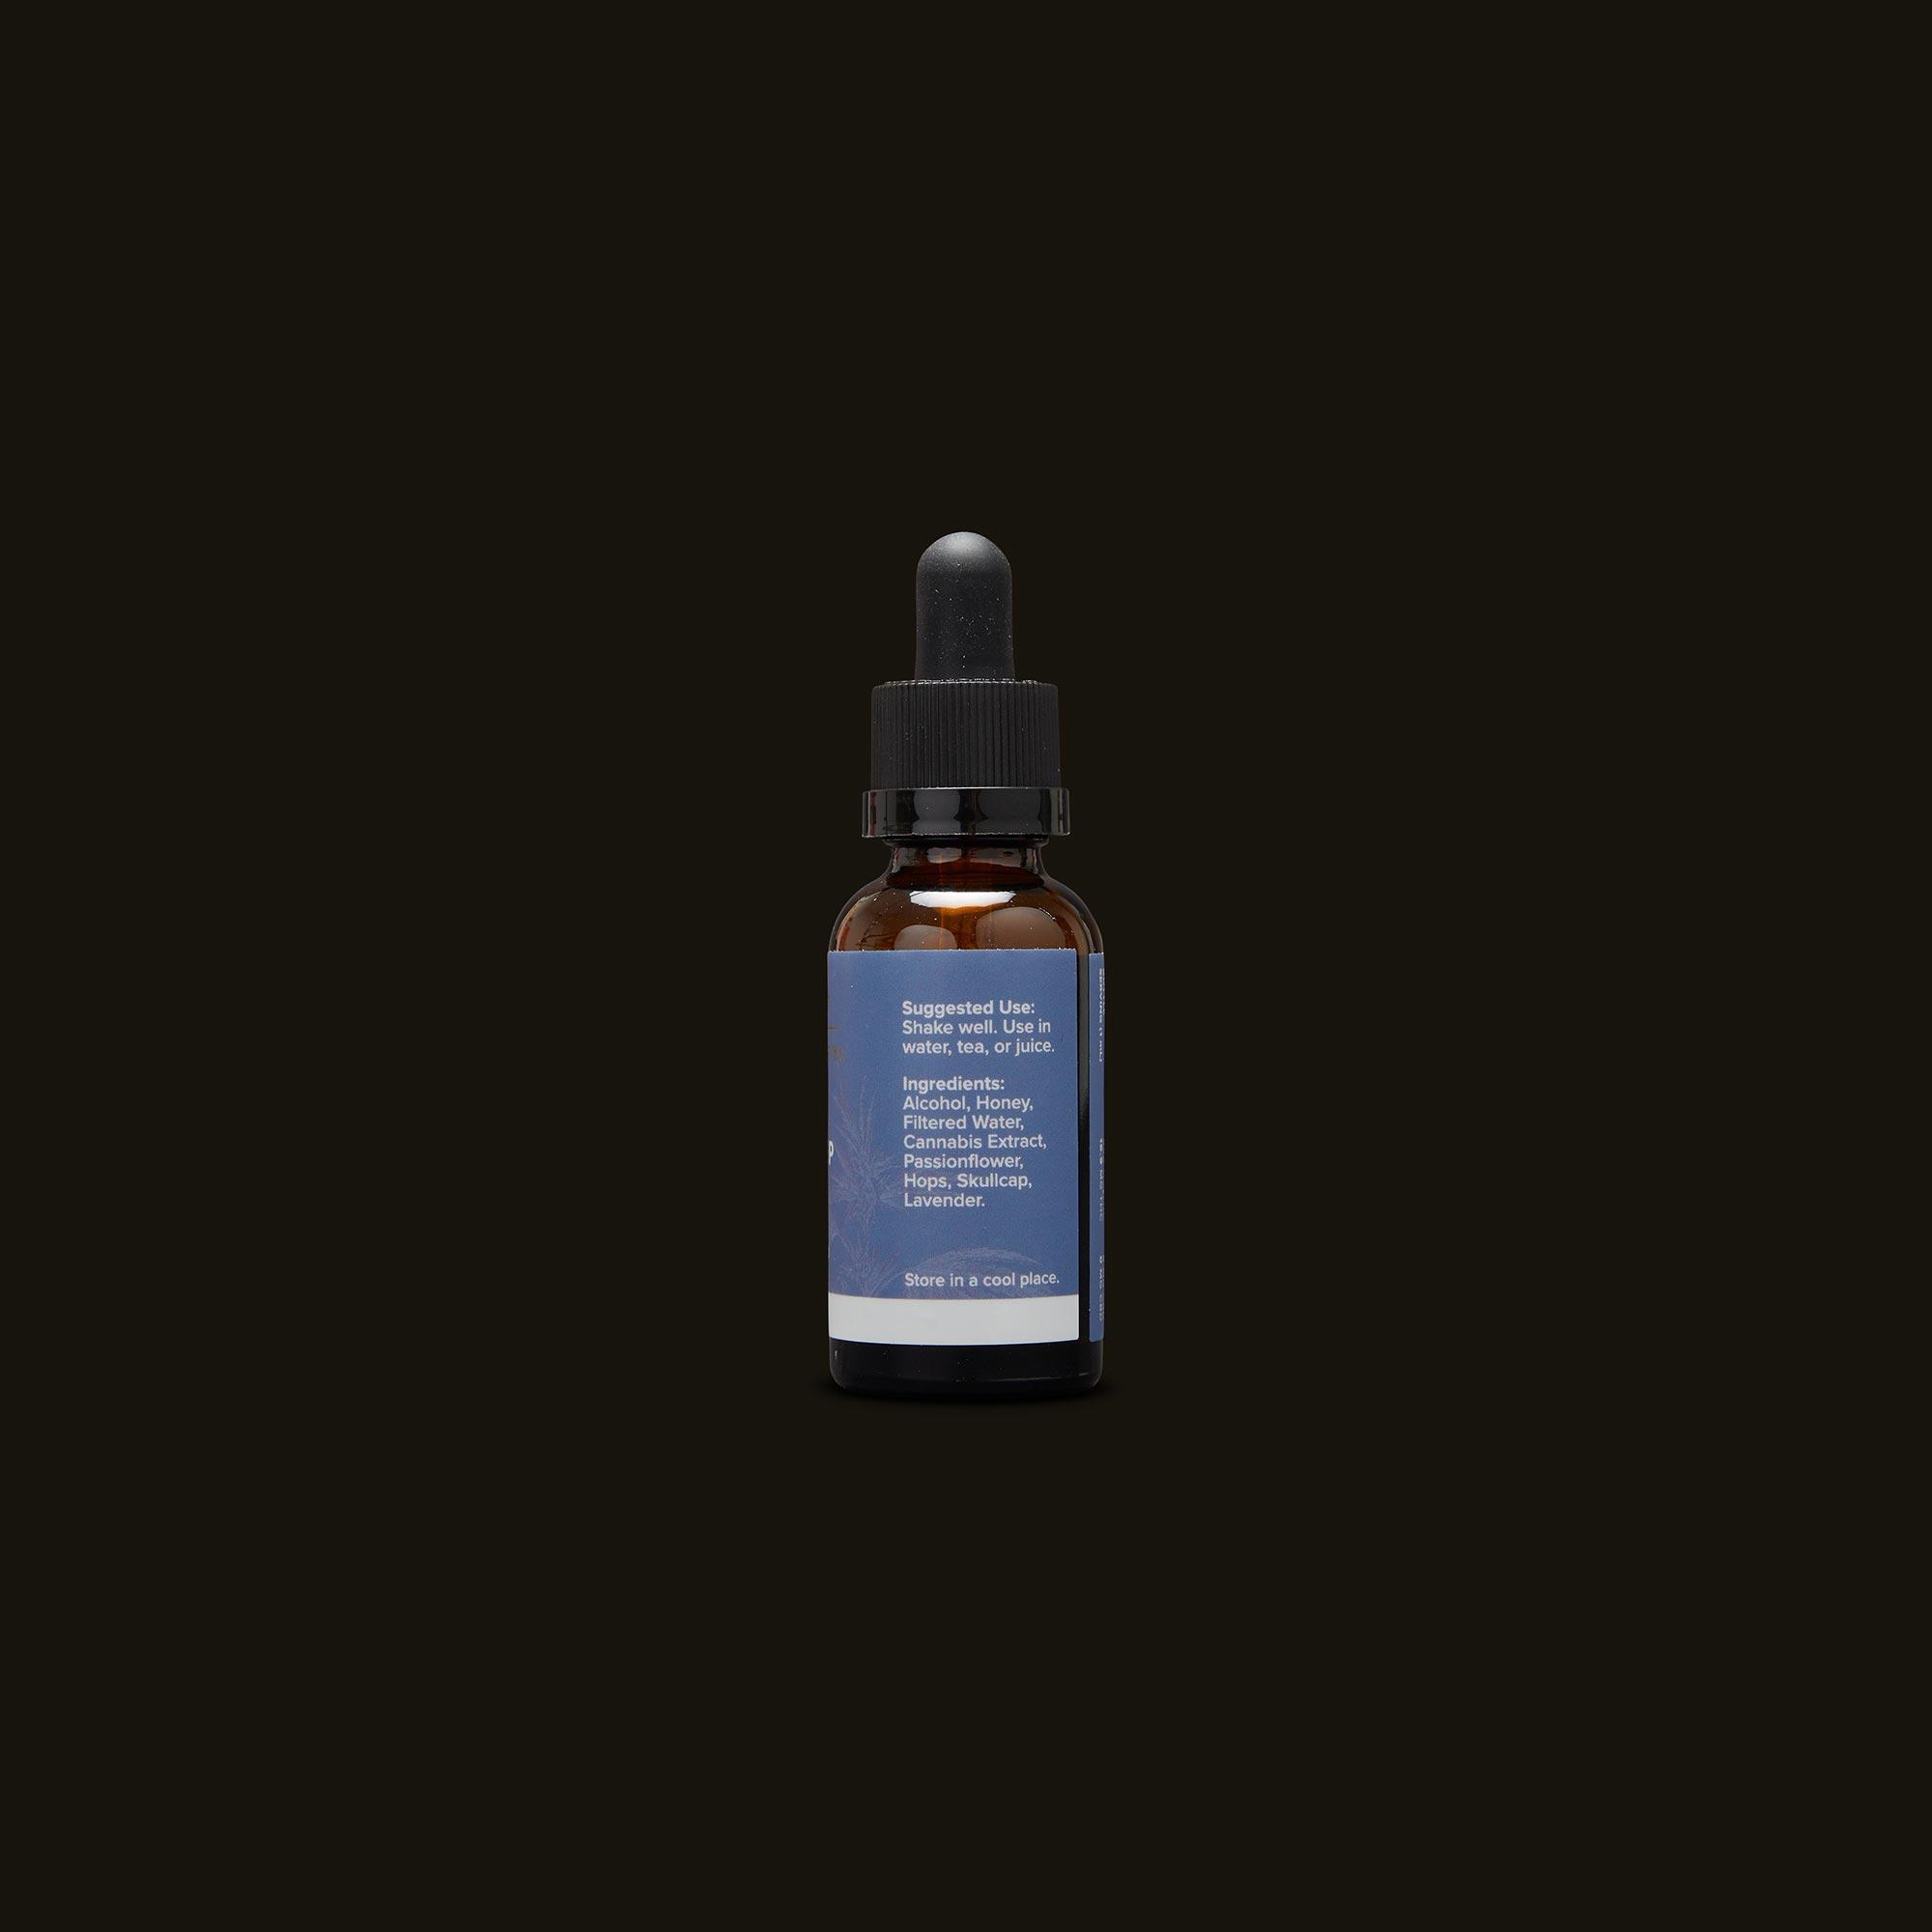 Humboldt Apothecary Deep Sleep Ingredients